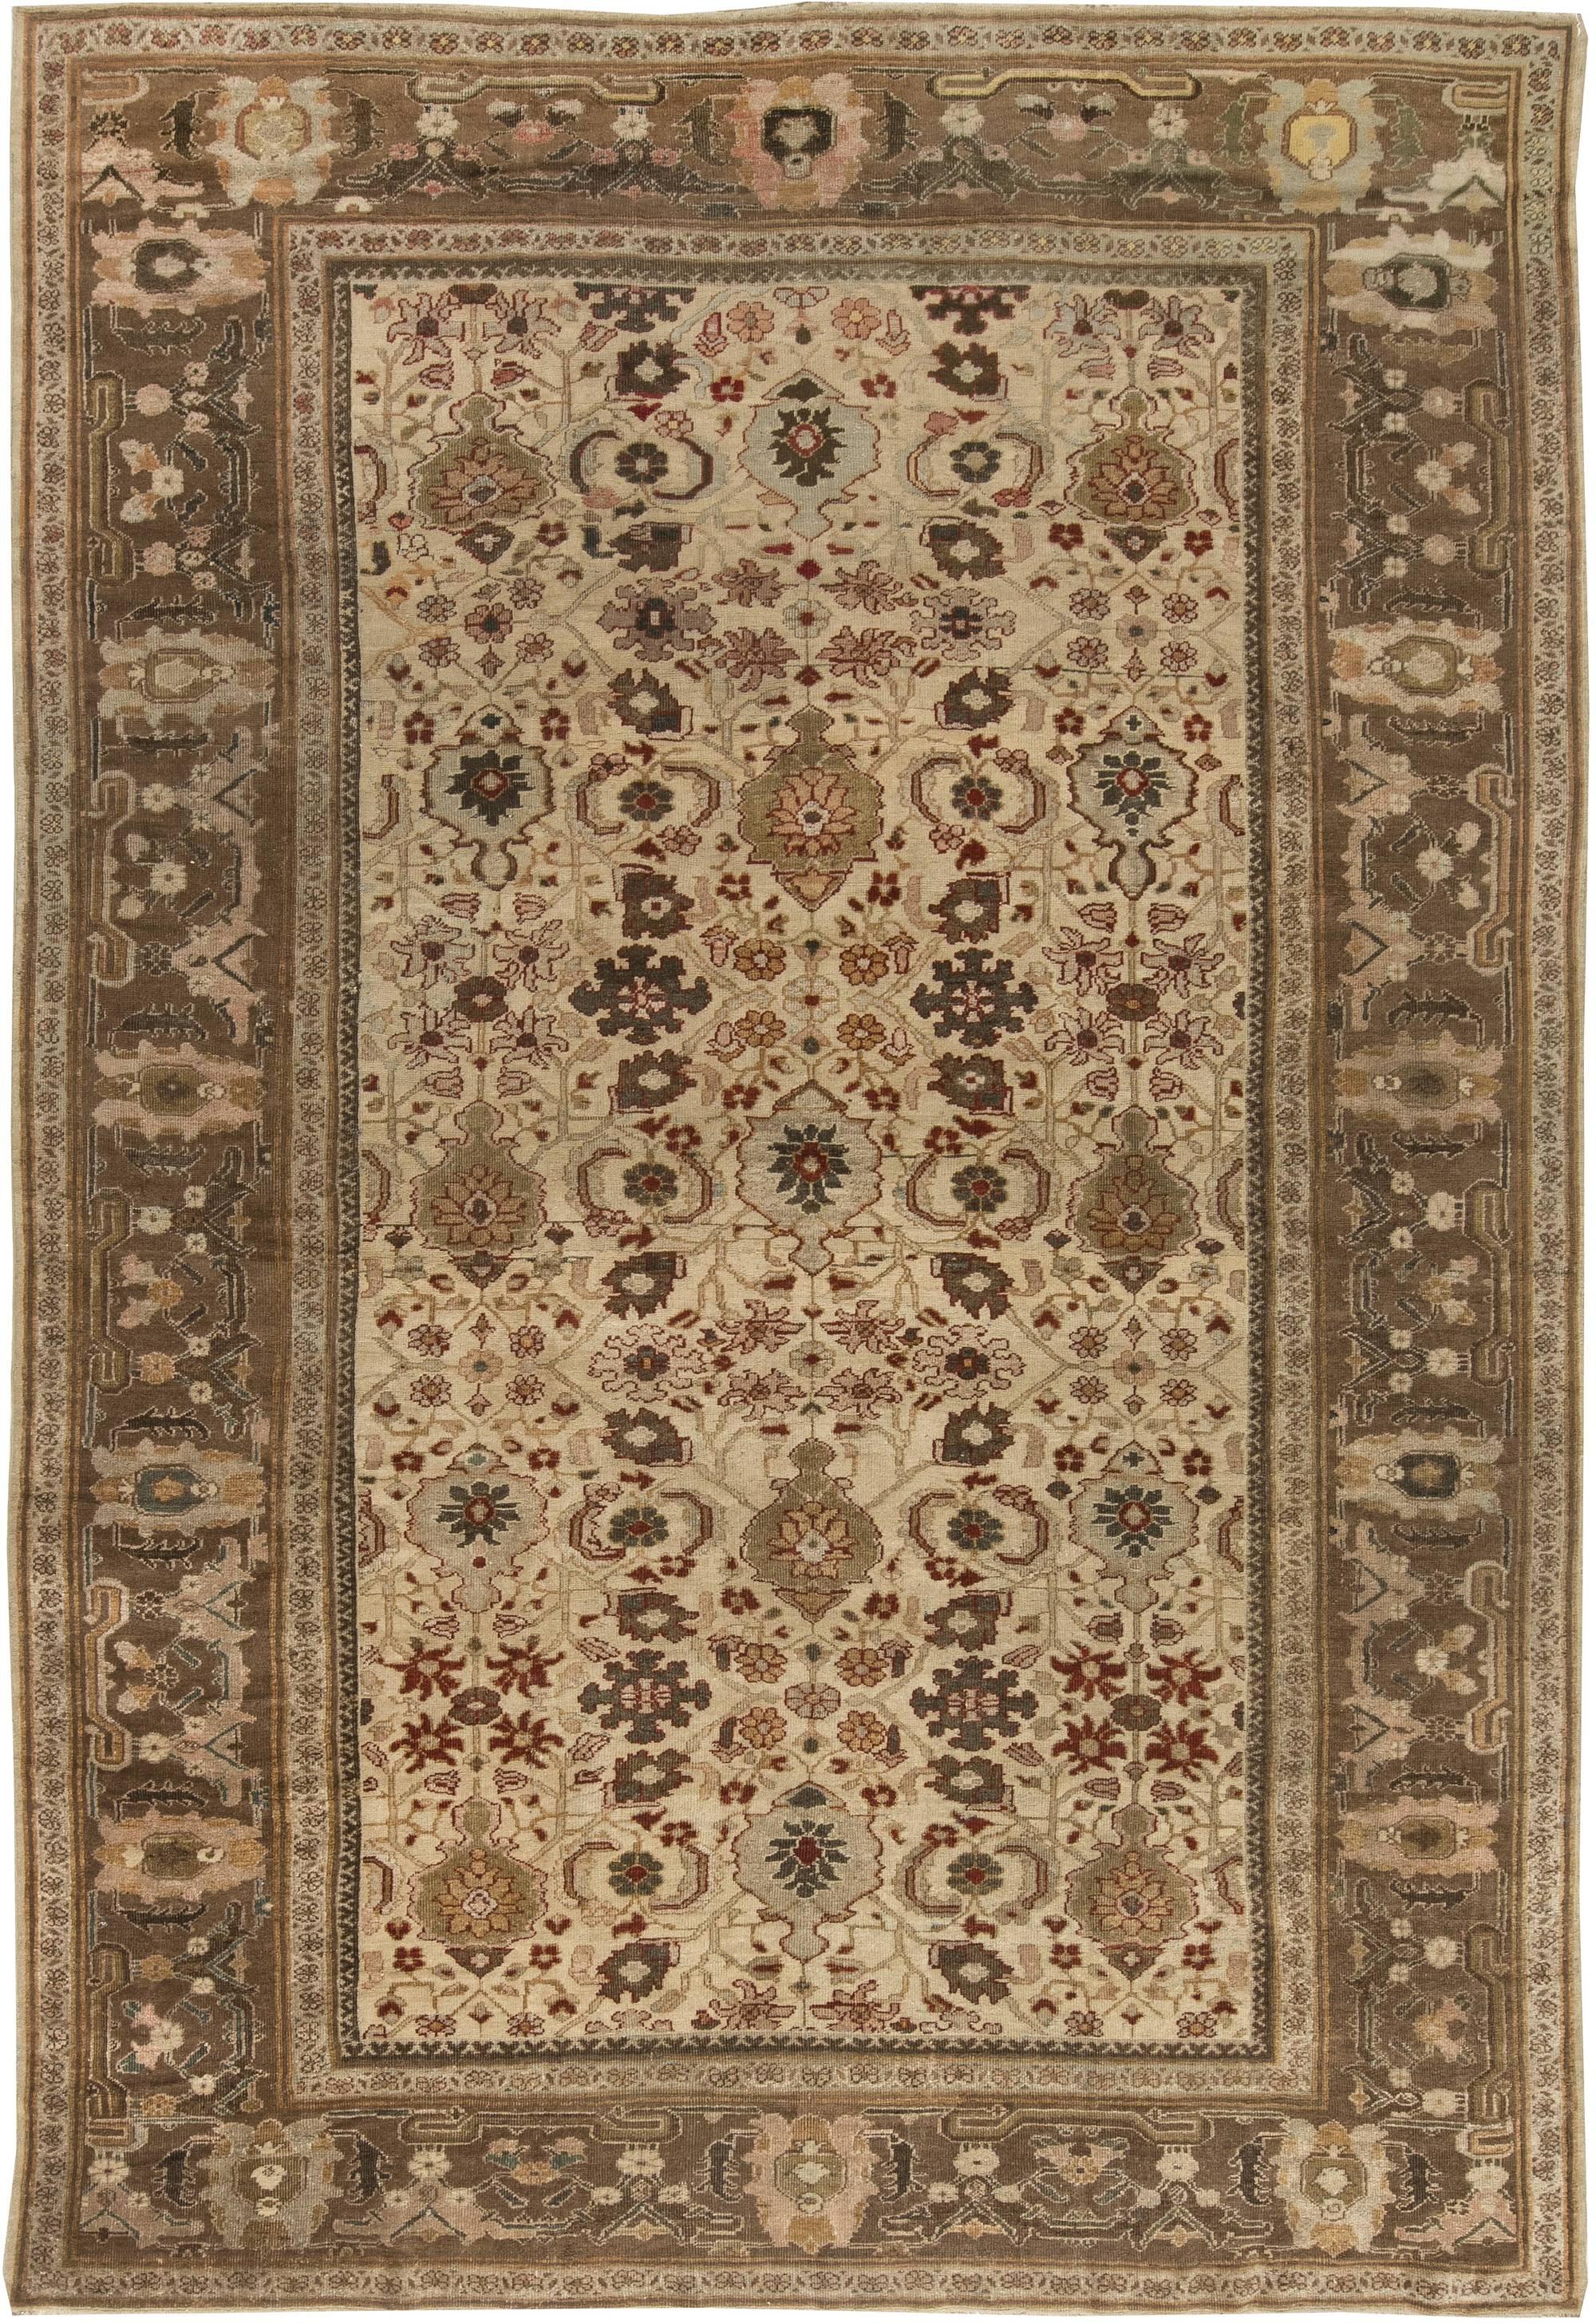 Antique Persian Sultanabad Rug Bb6453 By Doris Leslie Blau